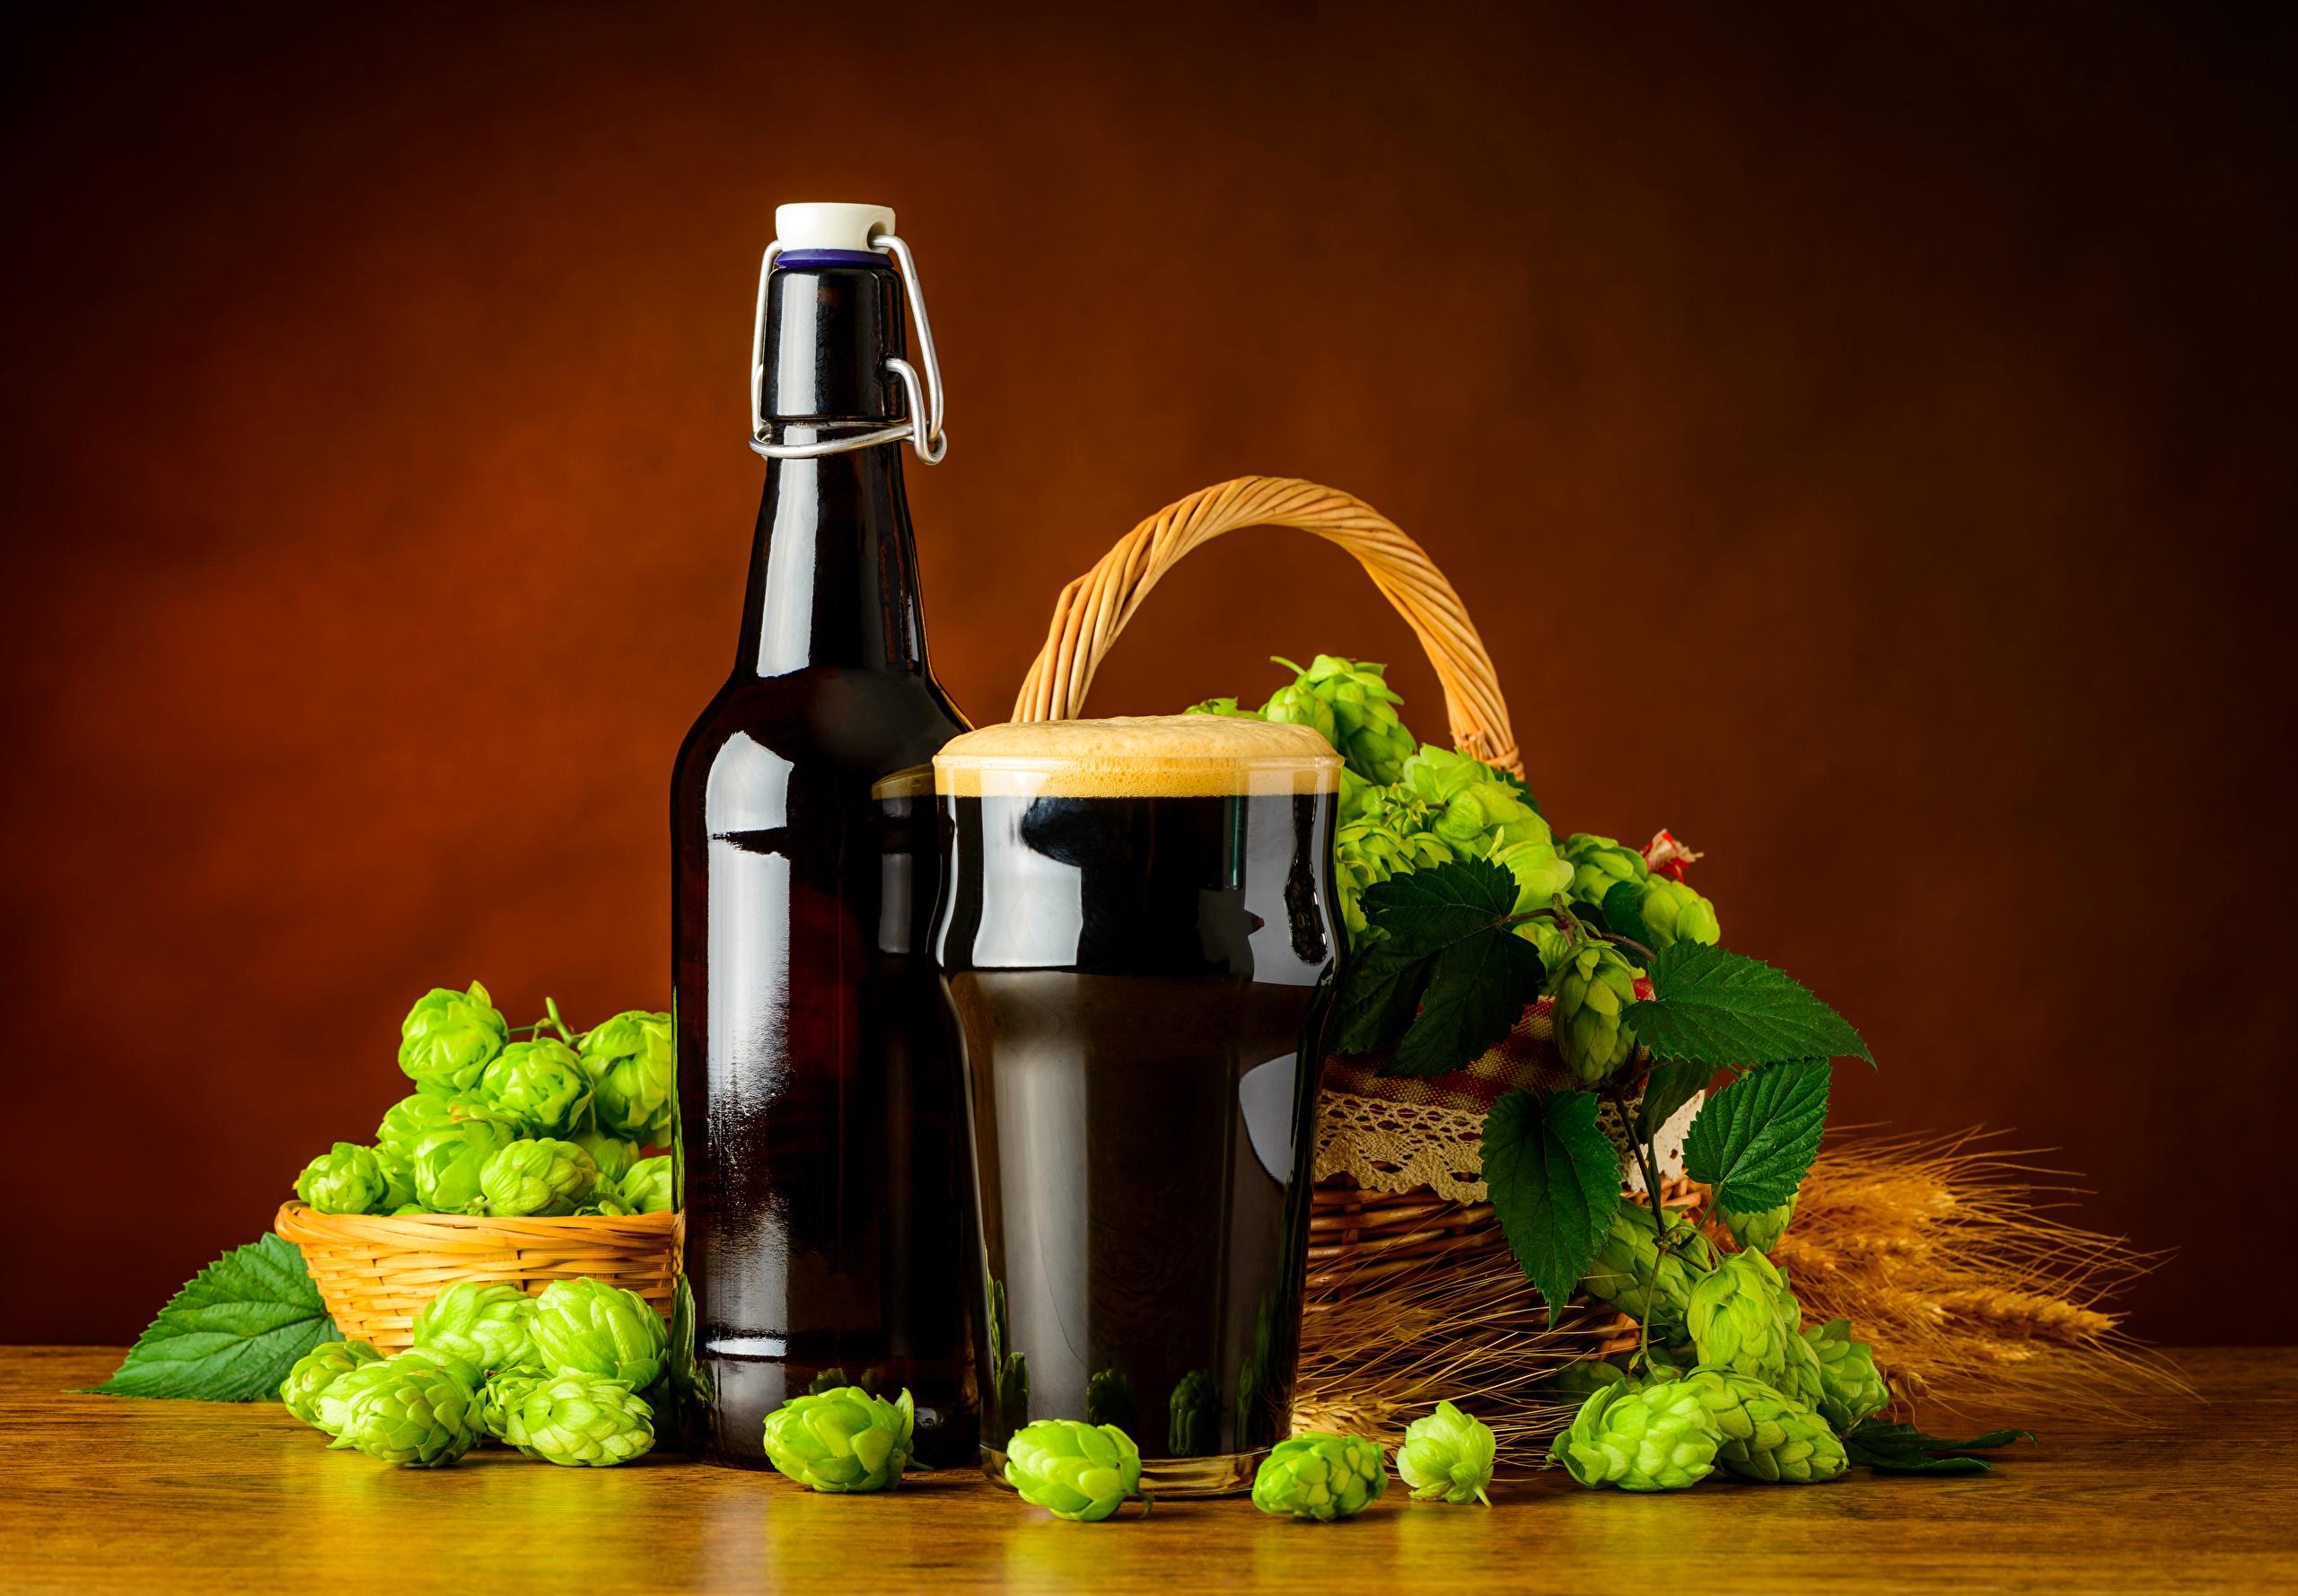 Картинки Пиво Хмель Стакан Пища Пена Бутылка 2560x1778 стакана стакане Еда пене пеной бутылки Продукты питания